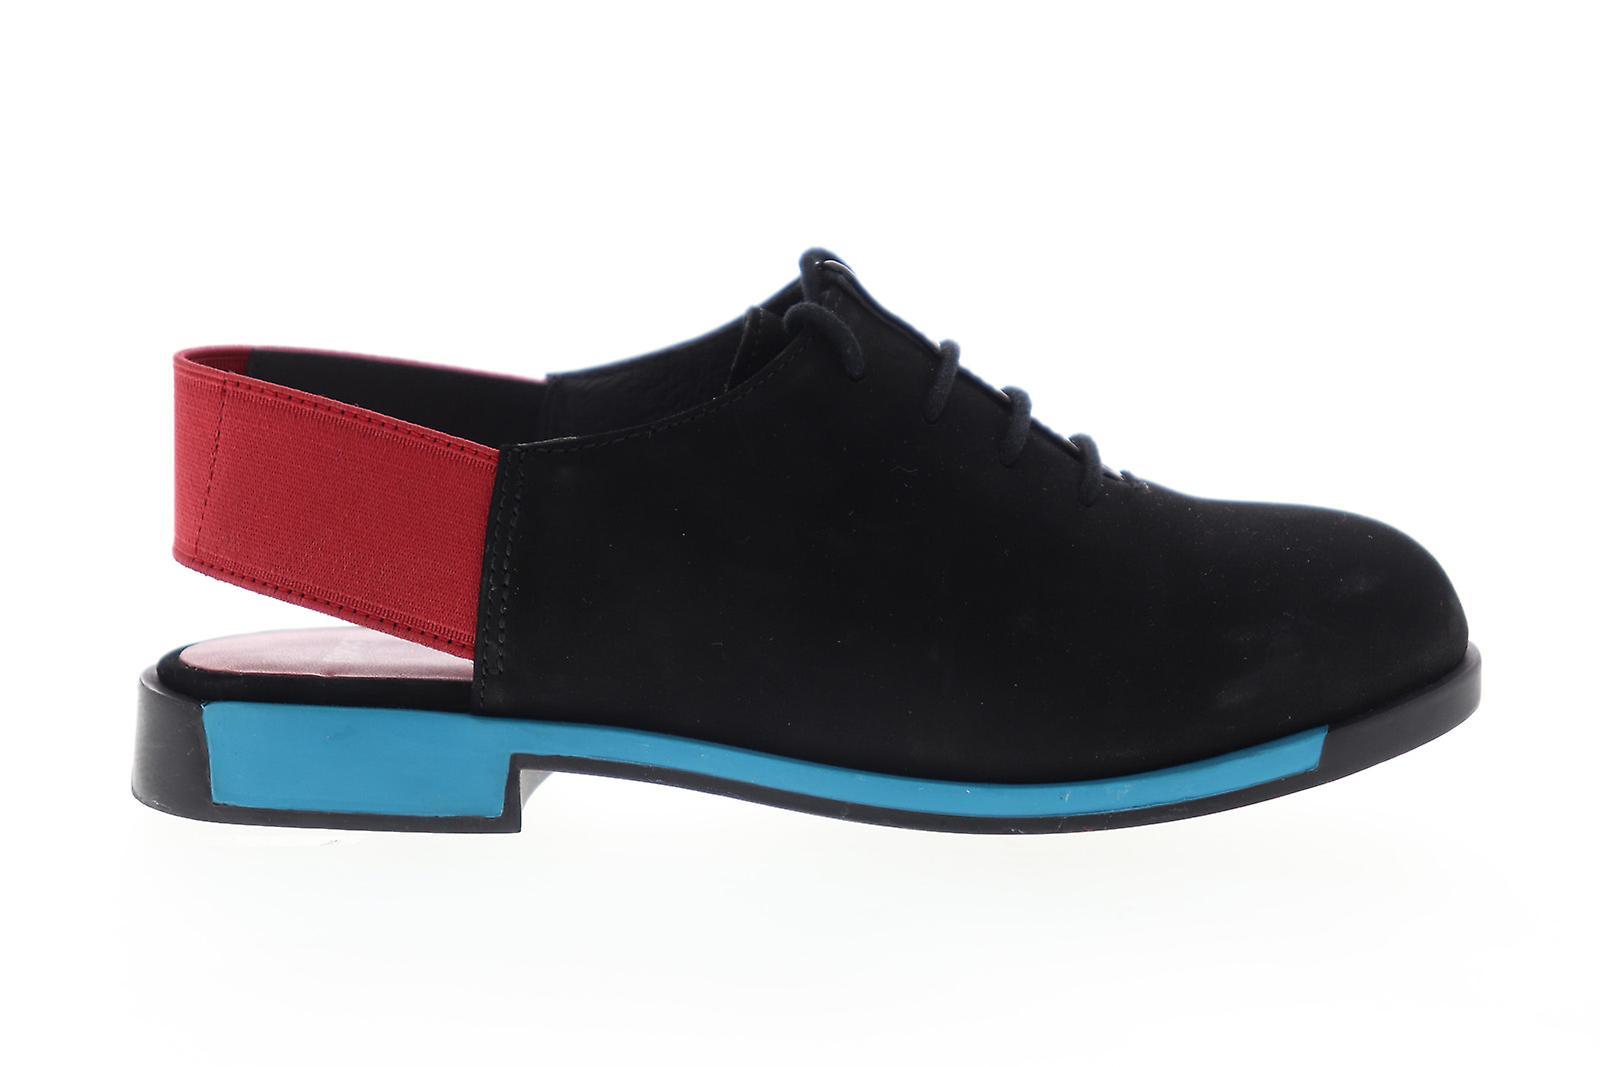 Camper Bowie Femmes Noir Nubuck Leather Flats Oxfords Chaussures anbG8u